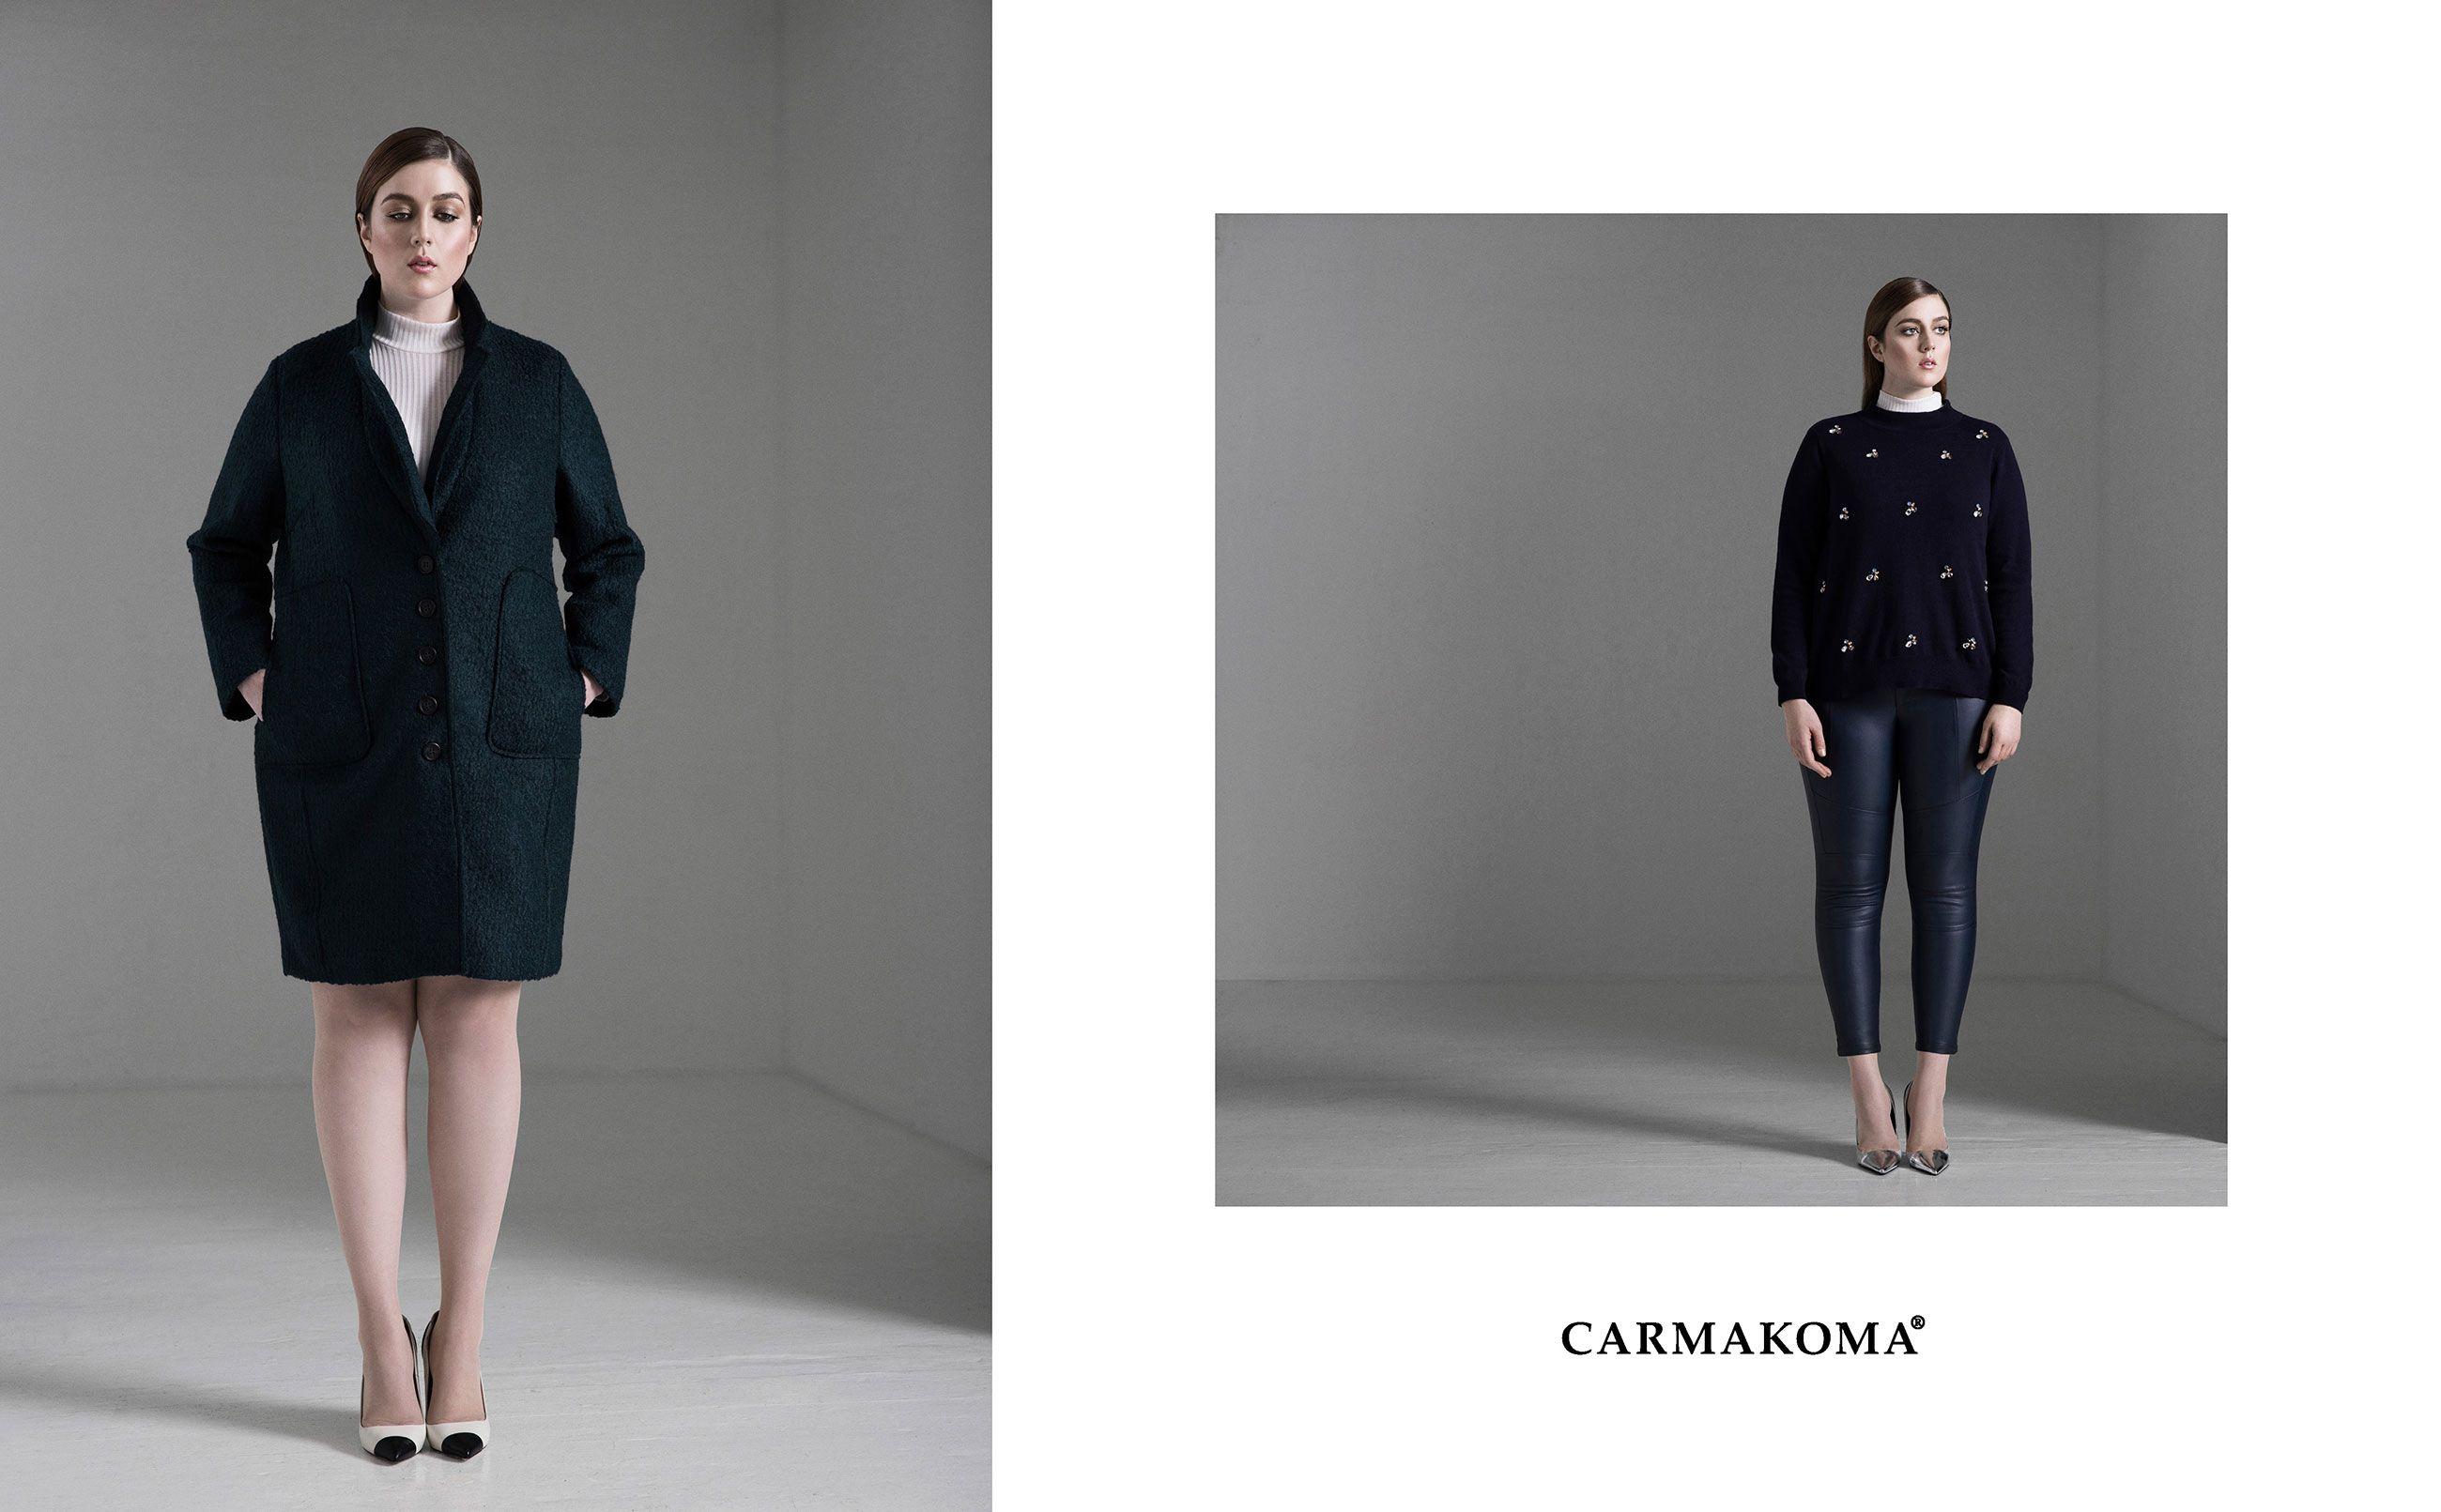 Carmakoma - Inspiration